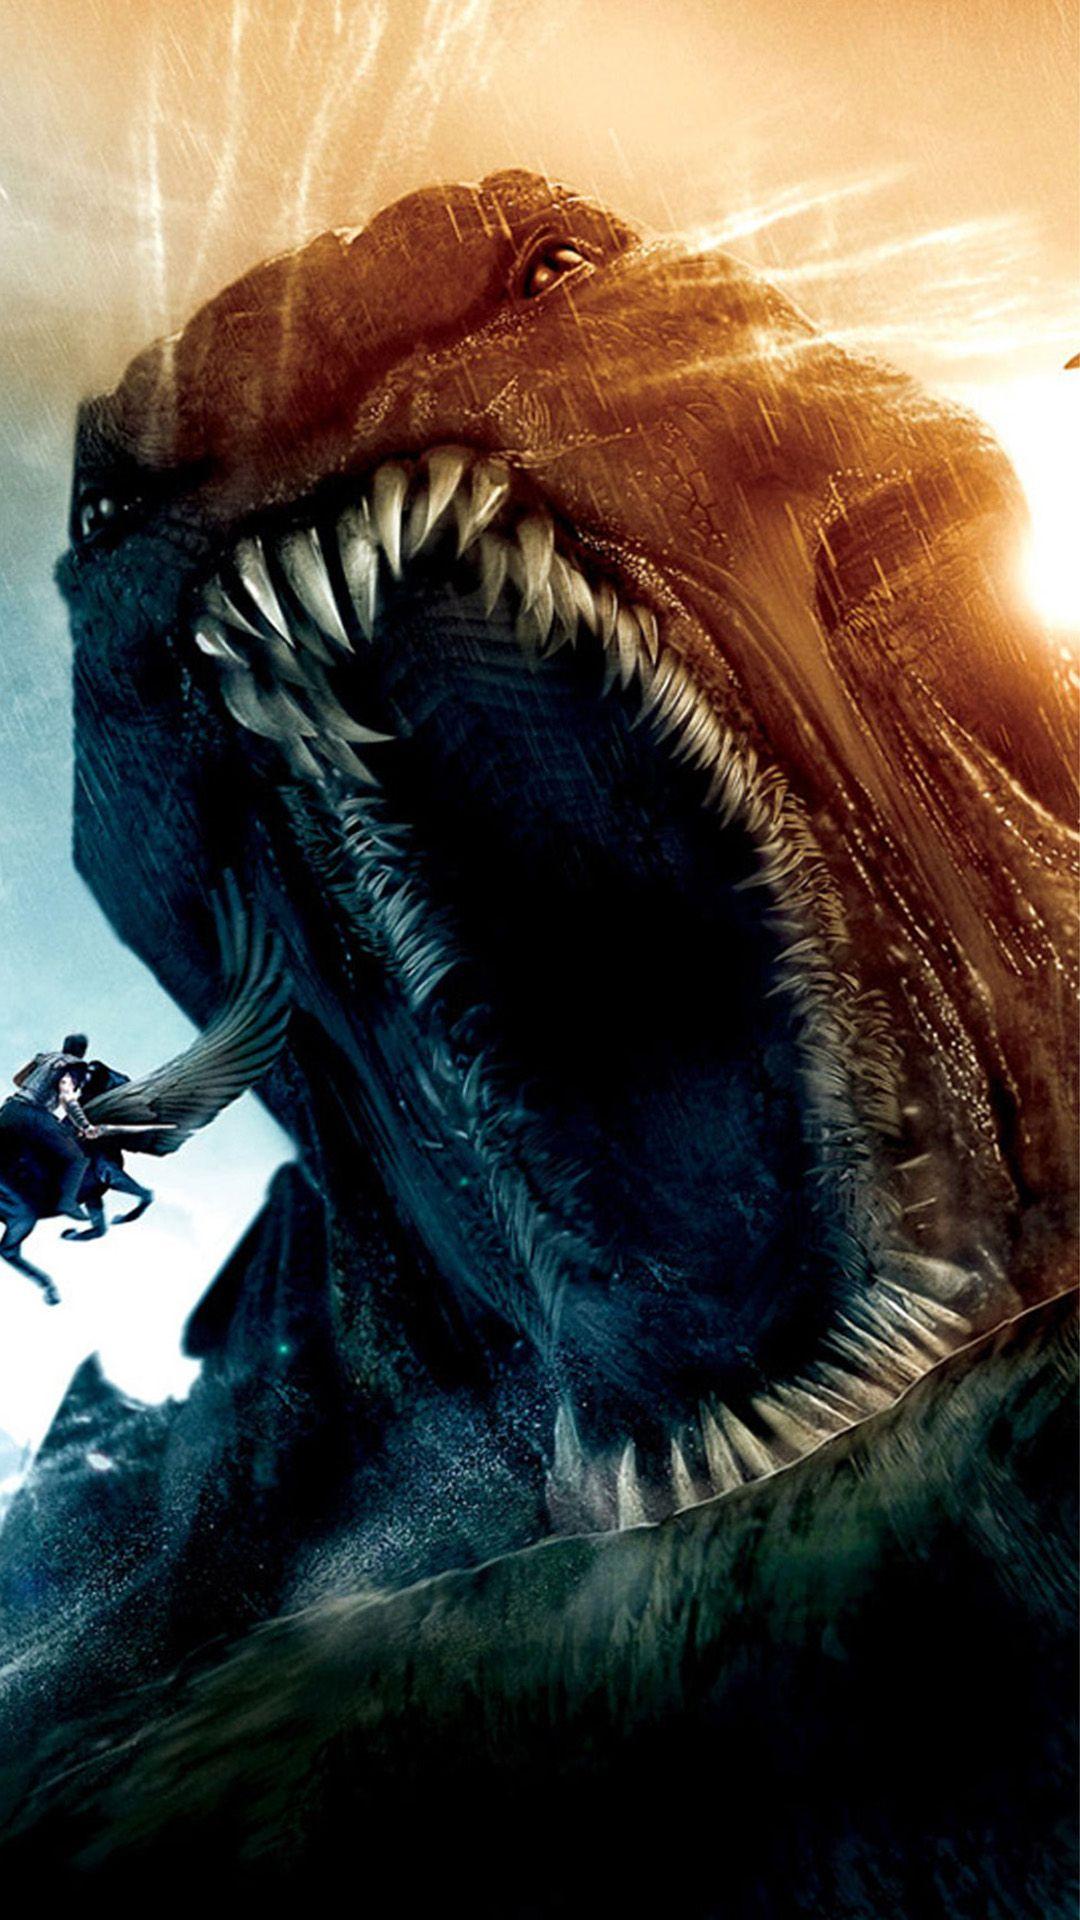 Android Fondos De Pantalla De Animales Clash Of The Titans Wrath Of The Titans Kraken